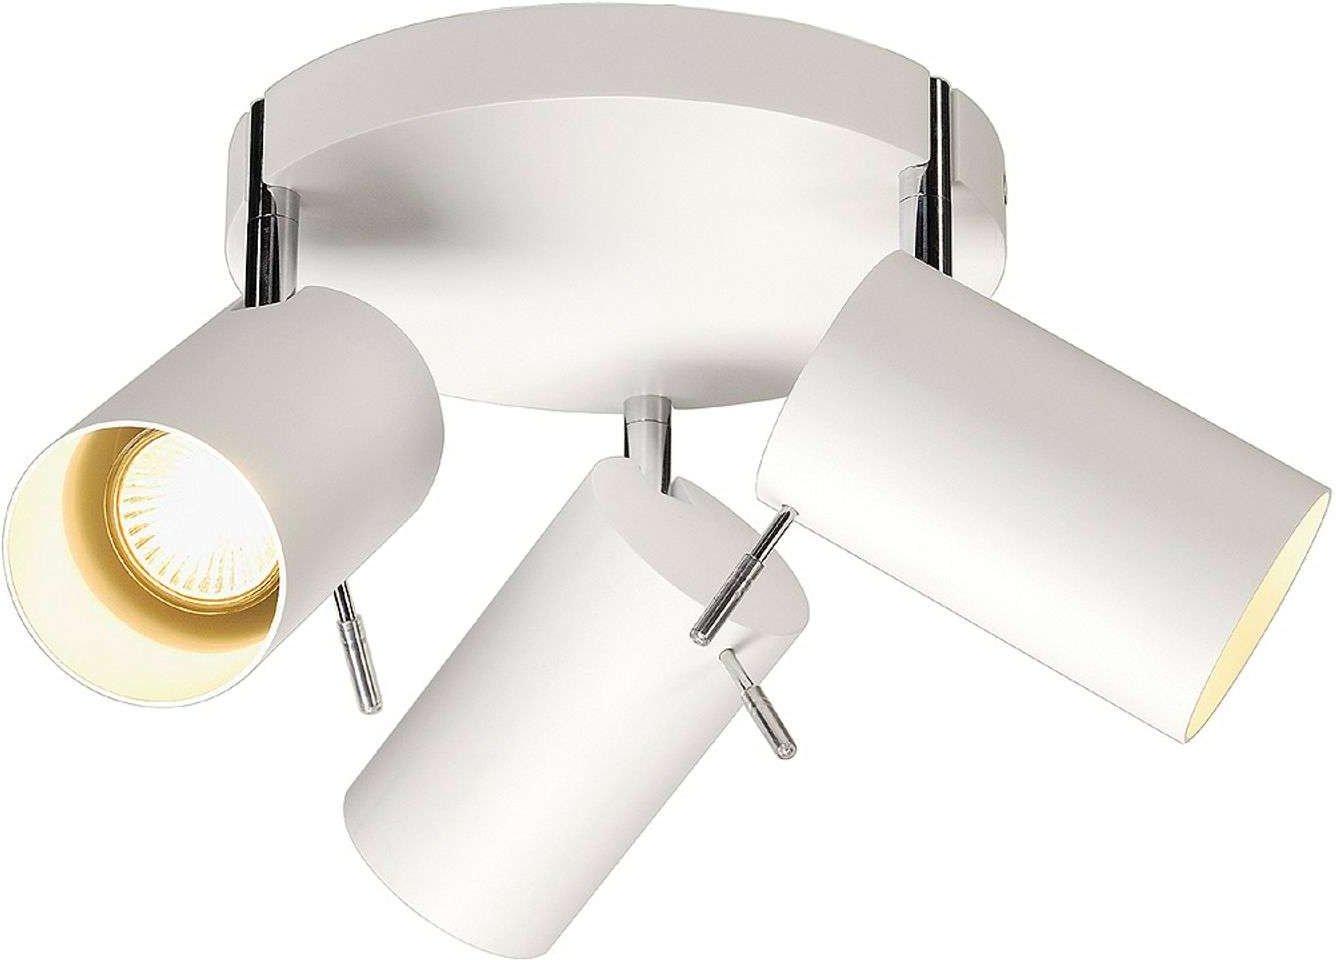 Round Asto Tube Ceiling Spot 3 Lamp White